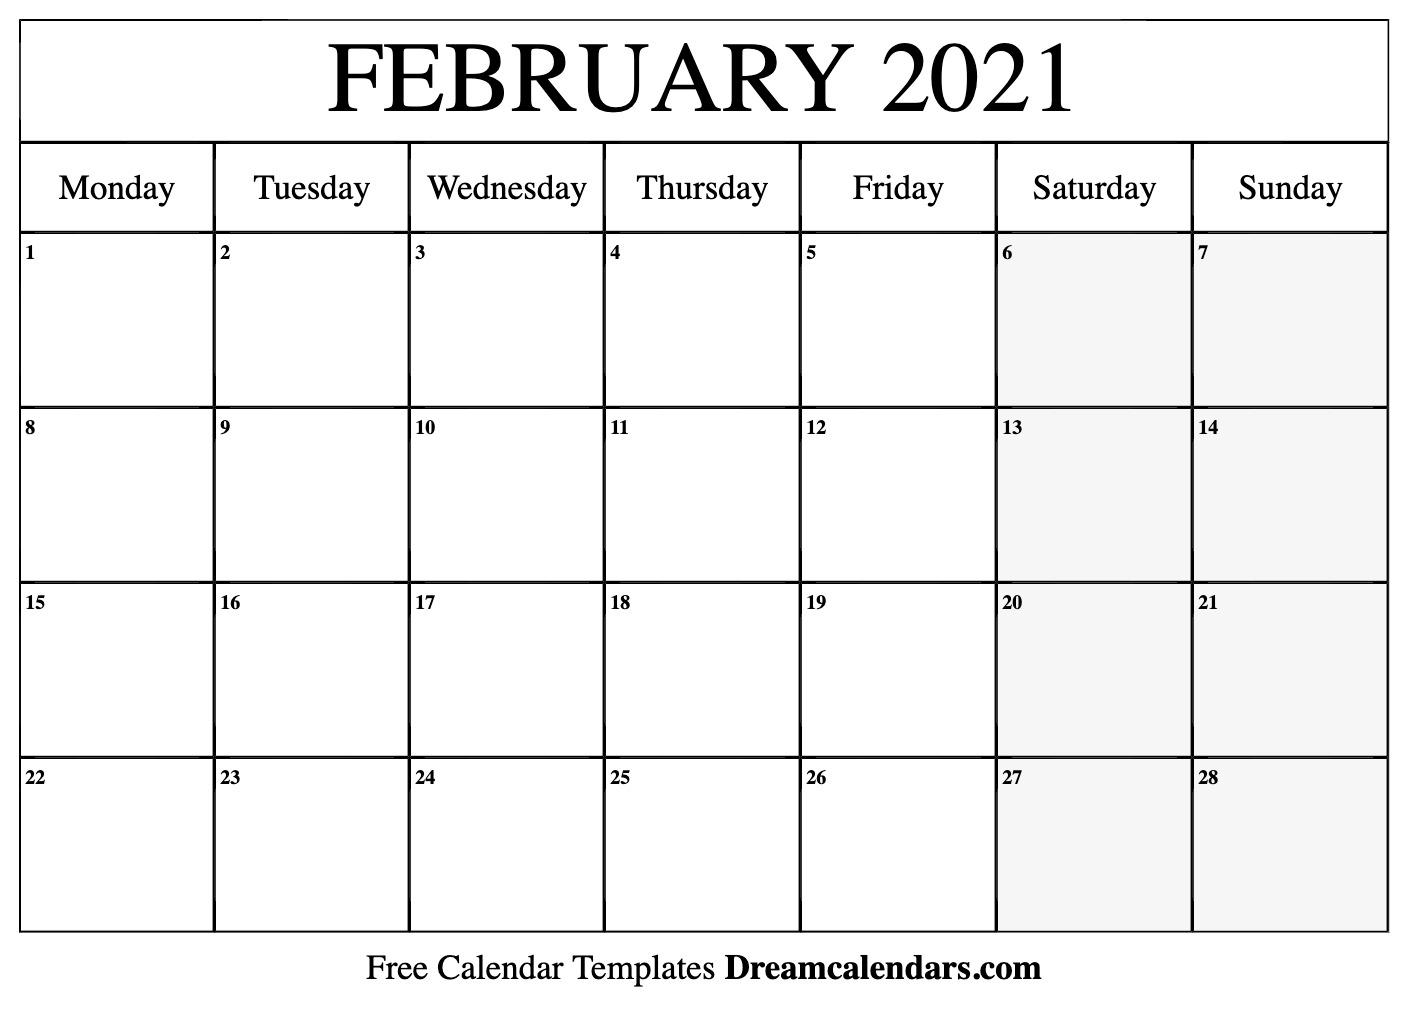 Calendar Feb 2022 Printable.February 2021 Calendar Free Blank Printable Templates